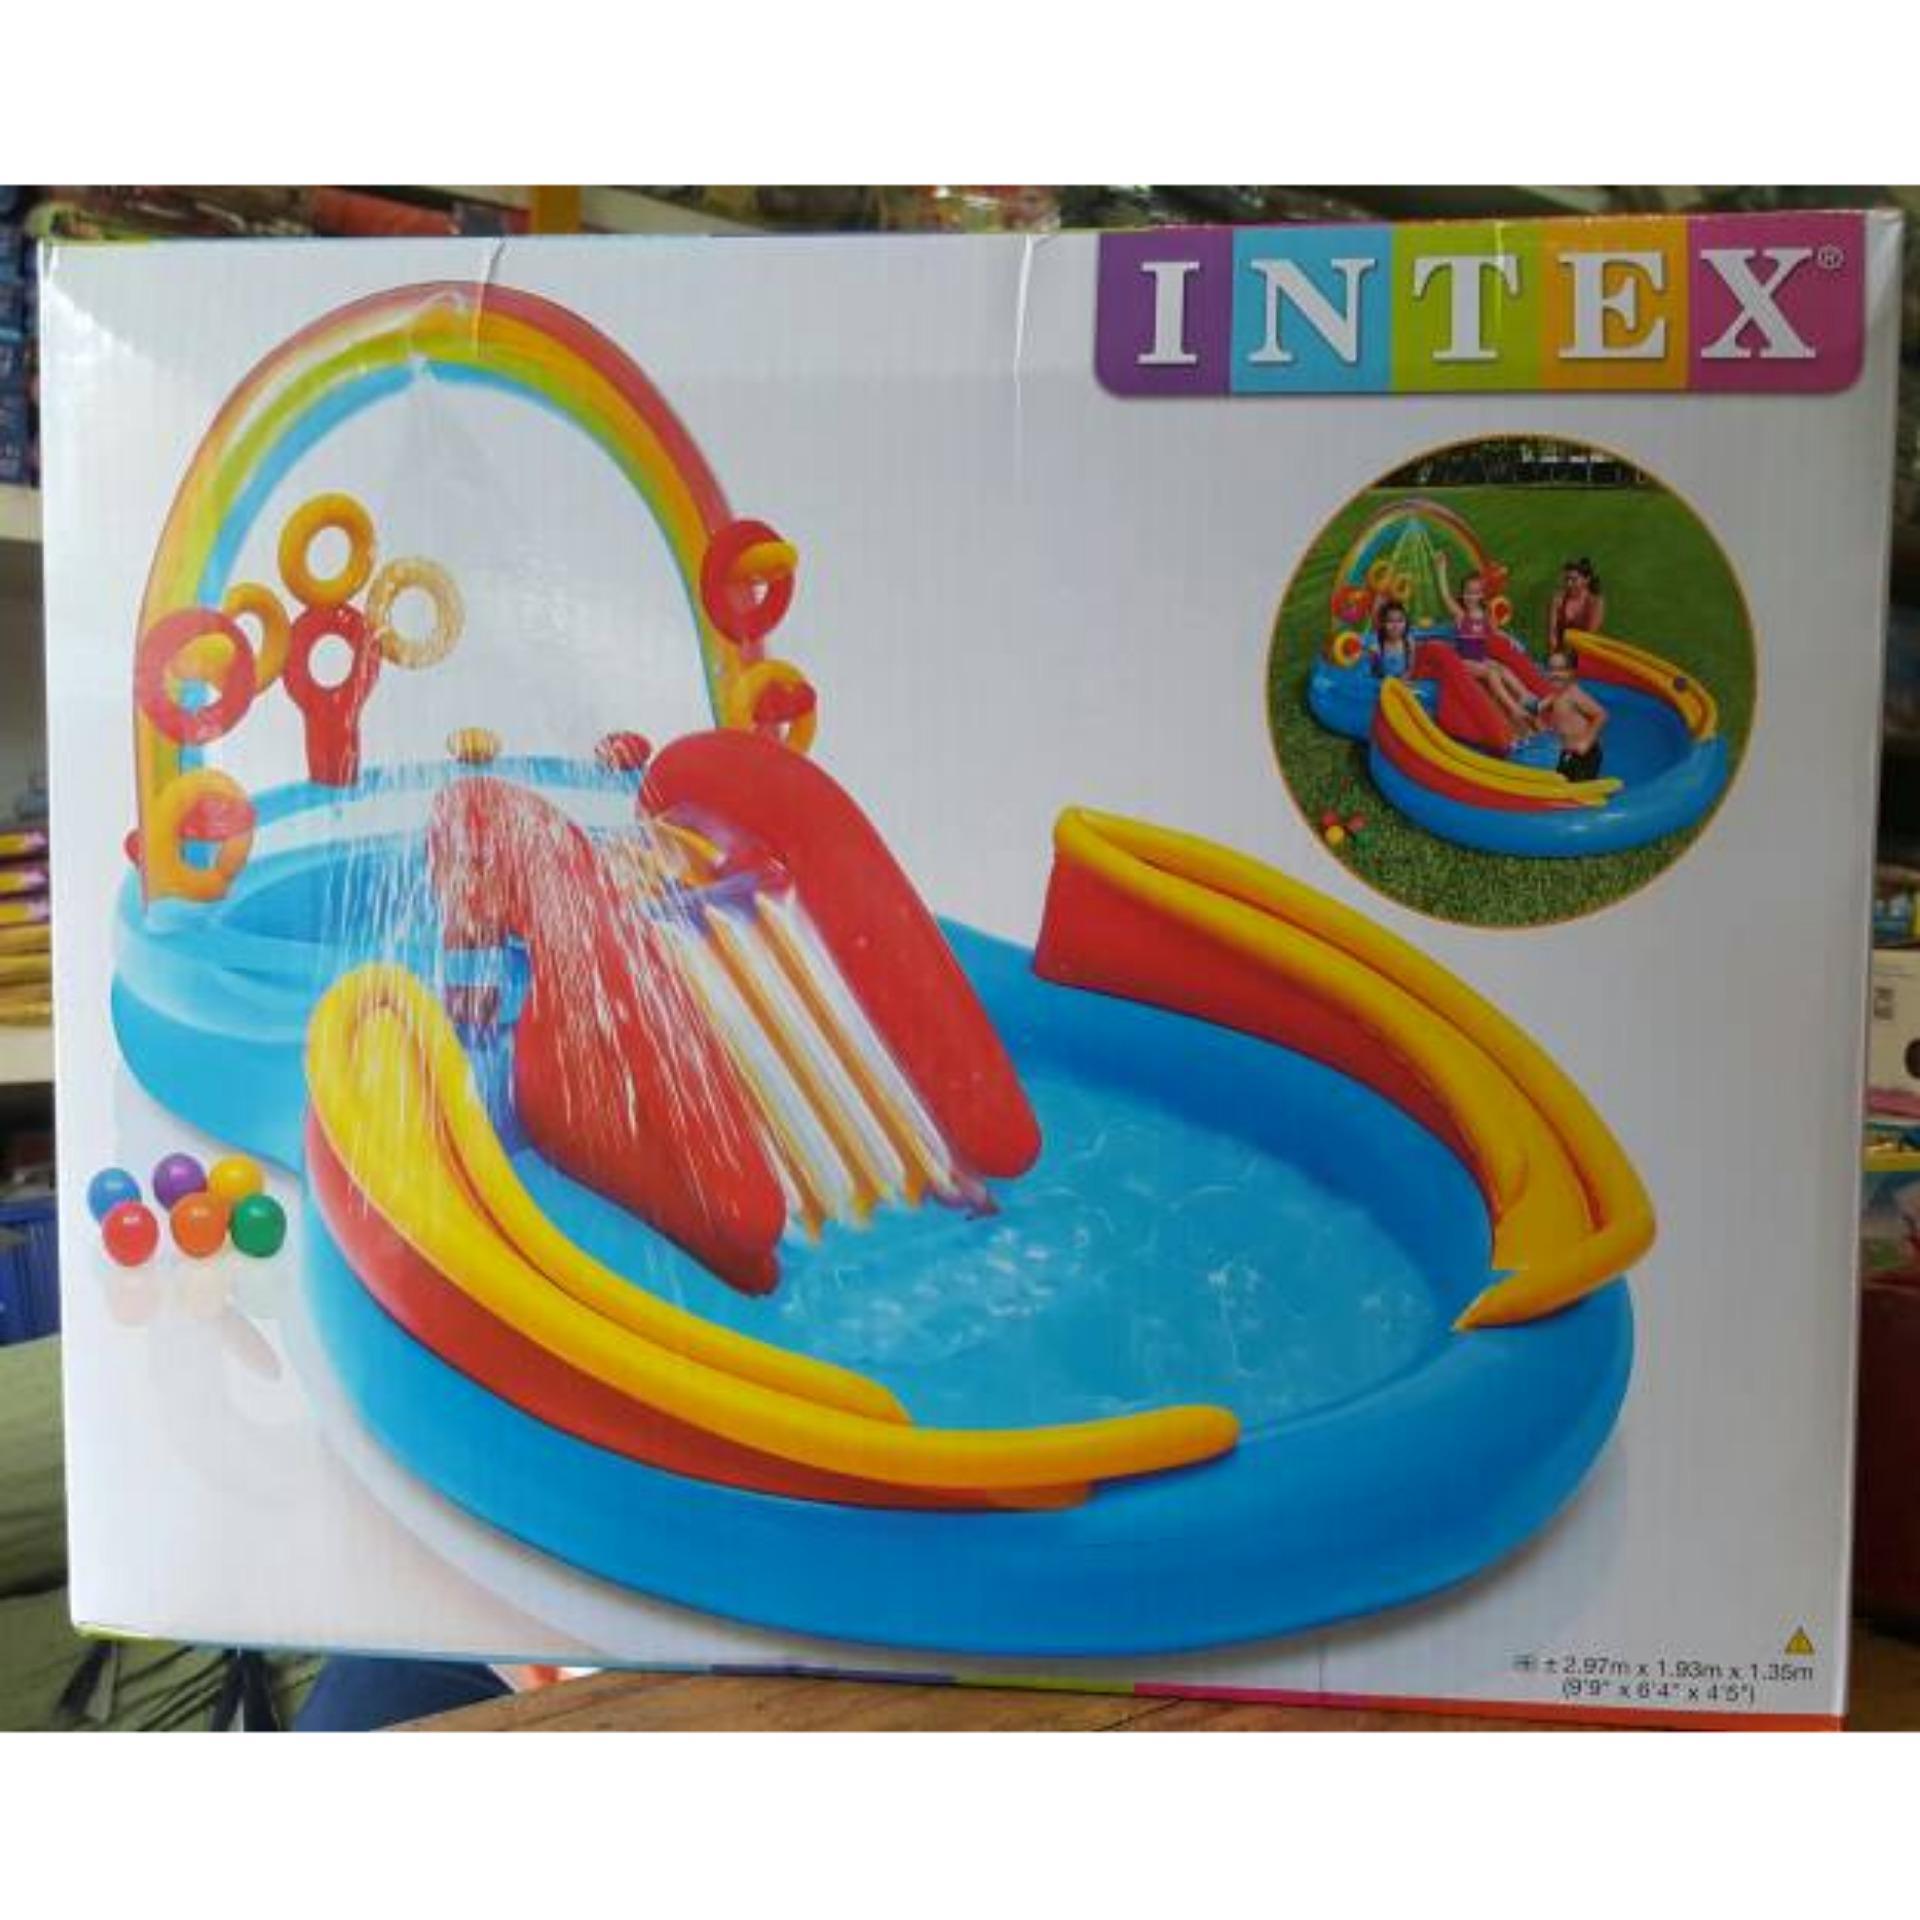 Intex 56441 Sunset Glow 4 Ring Rainbow Pool 168cm X 46cm Kolam ... - Obral Intex 58446 Crystal Blue Pool Kolam Renang Anak. Source · Intex Kolam Rainbow ...